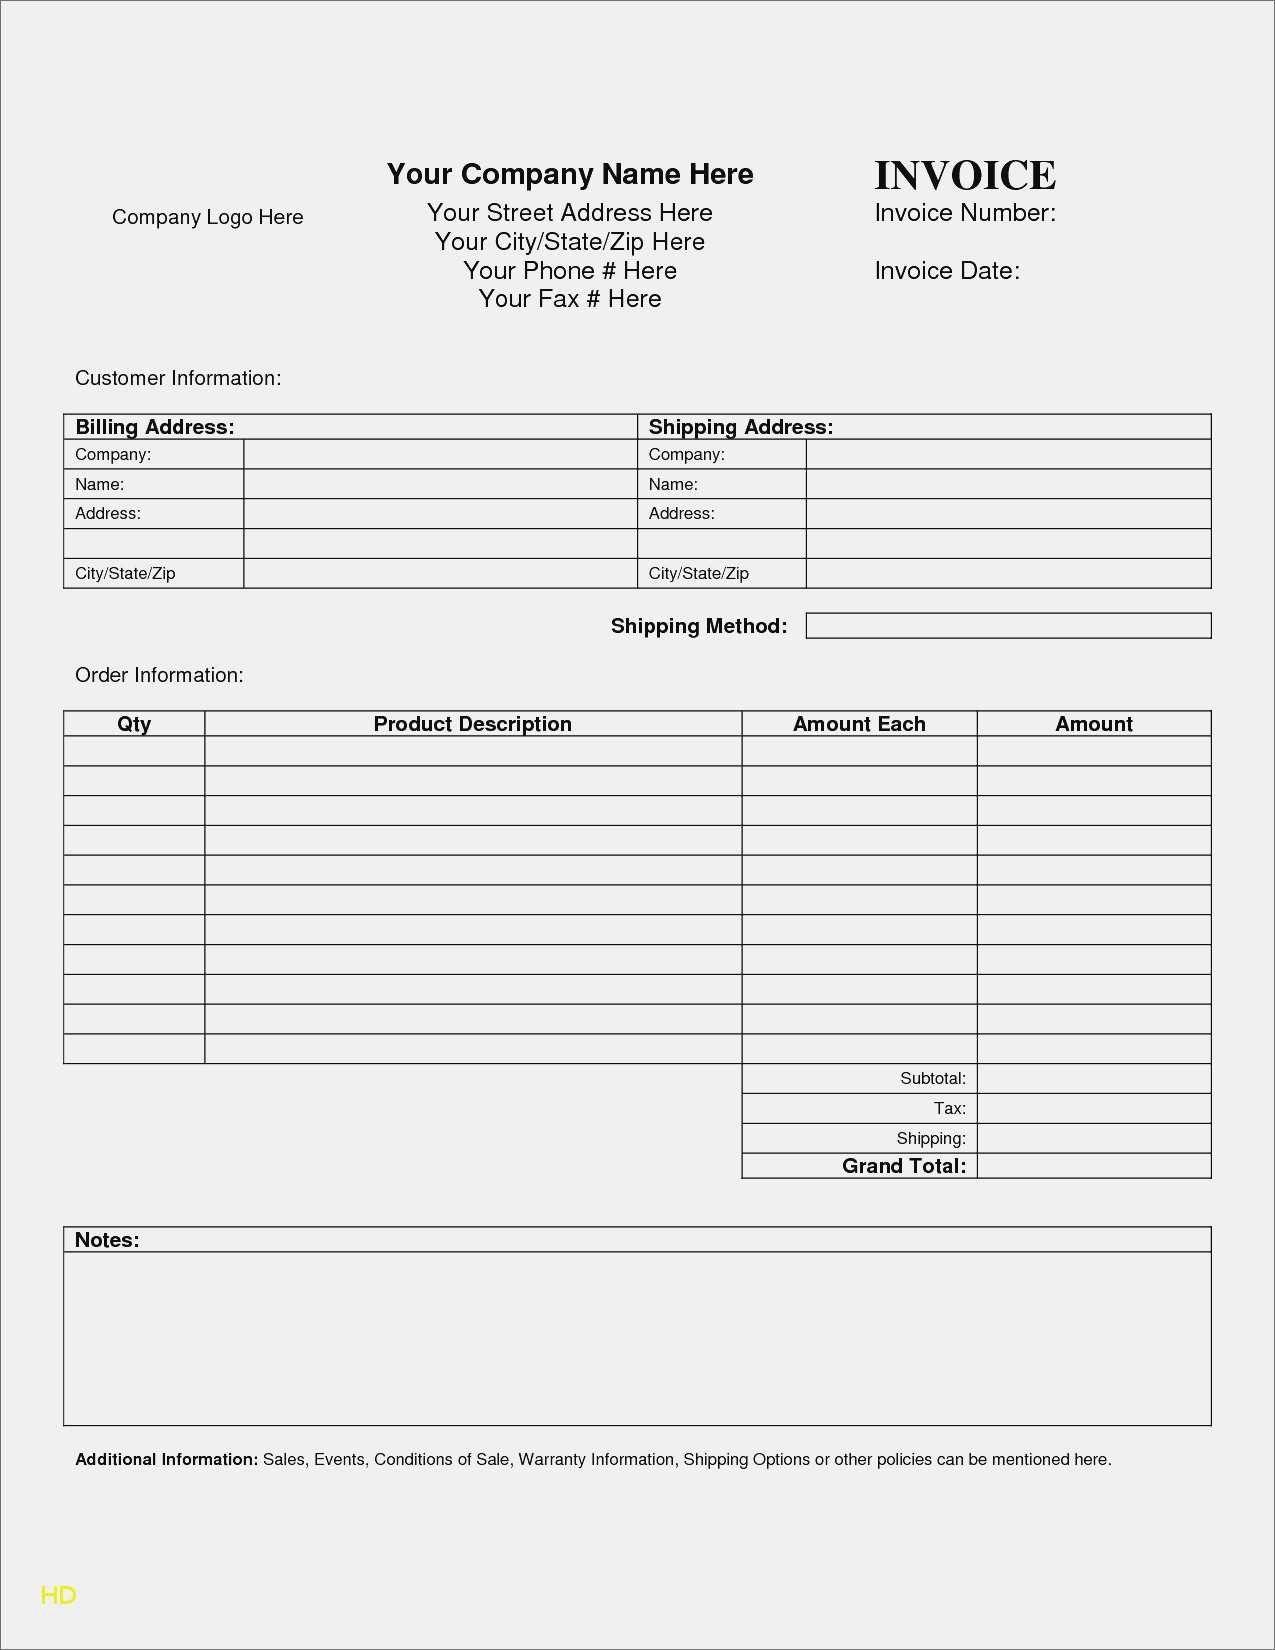 New Printable Invoice Templates Xls Xlsformat Xlstemplates Xlstemplate Check More At Https Mavensocial Co Printable Invoice Templates